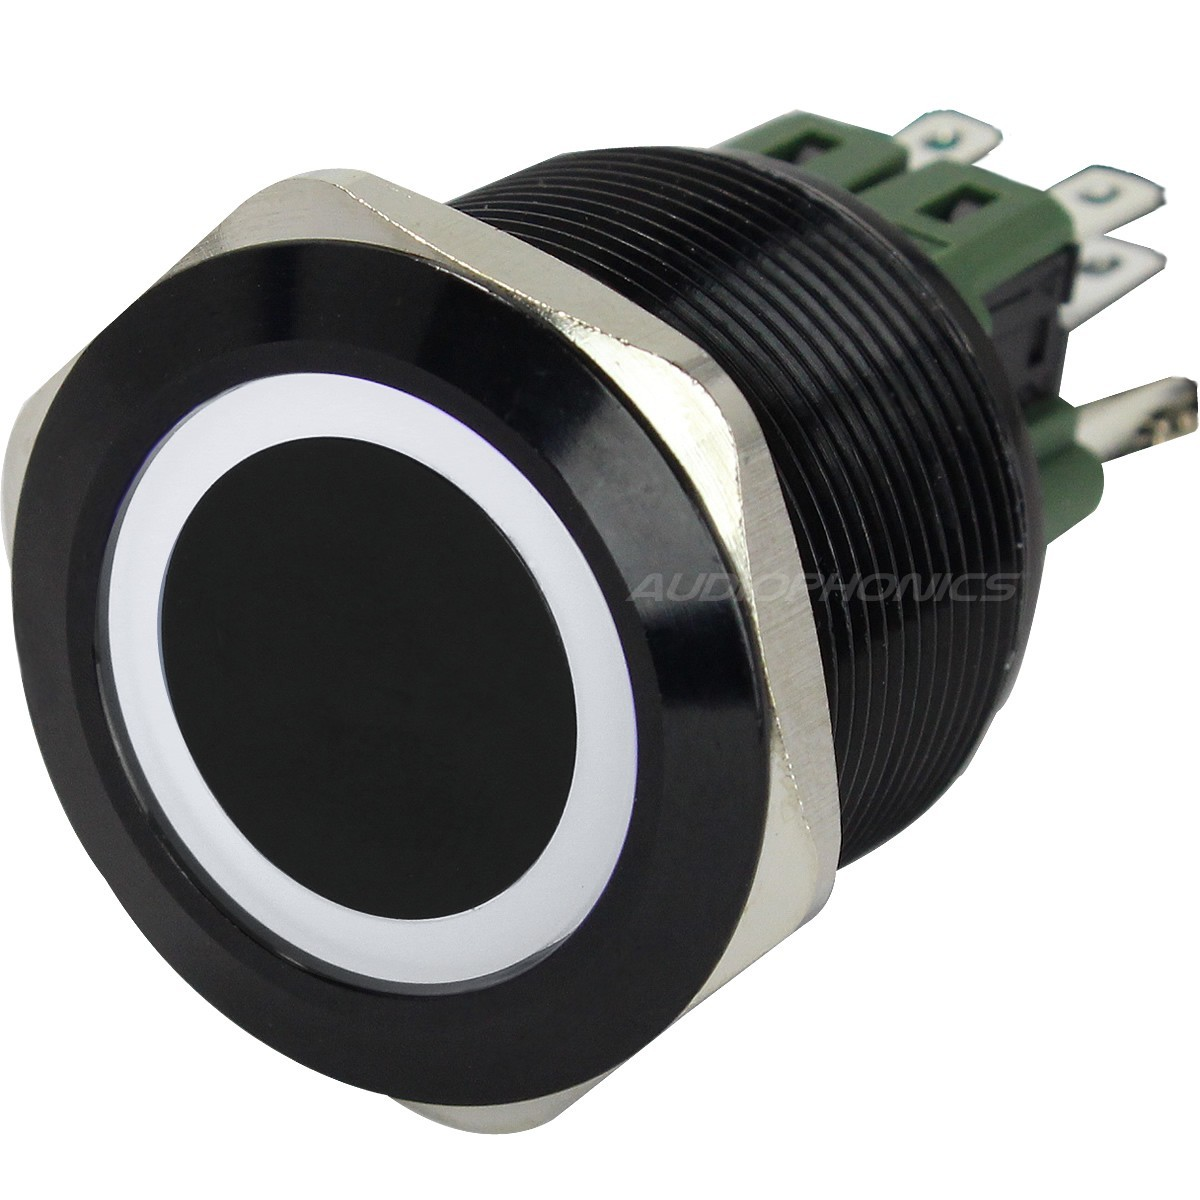 Aluminium Switch with White Light Circle 2NO2NC 250V 5A Ø25mm Black